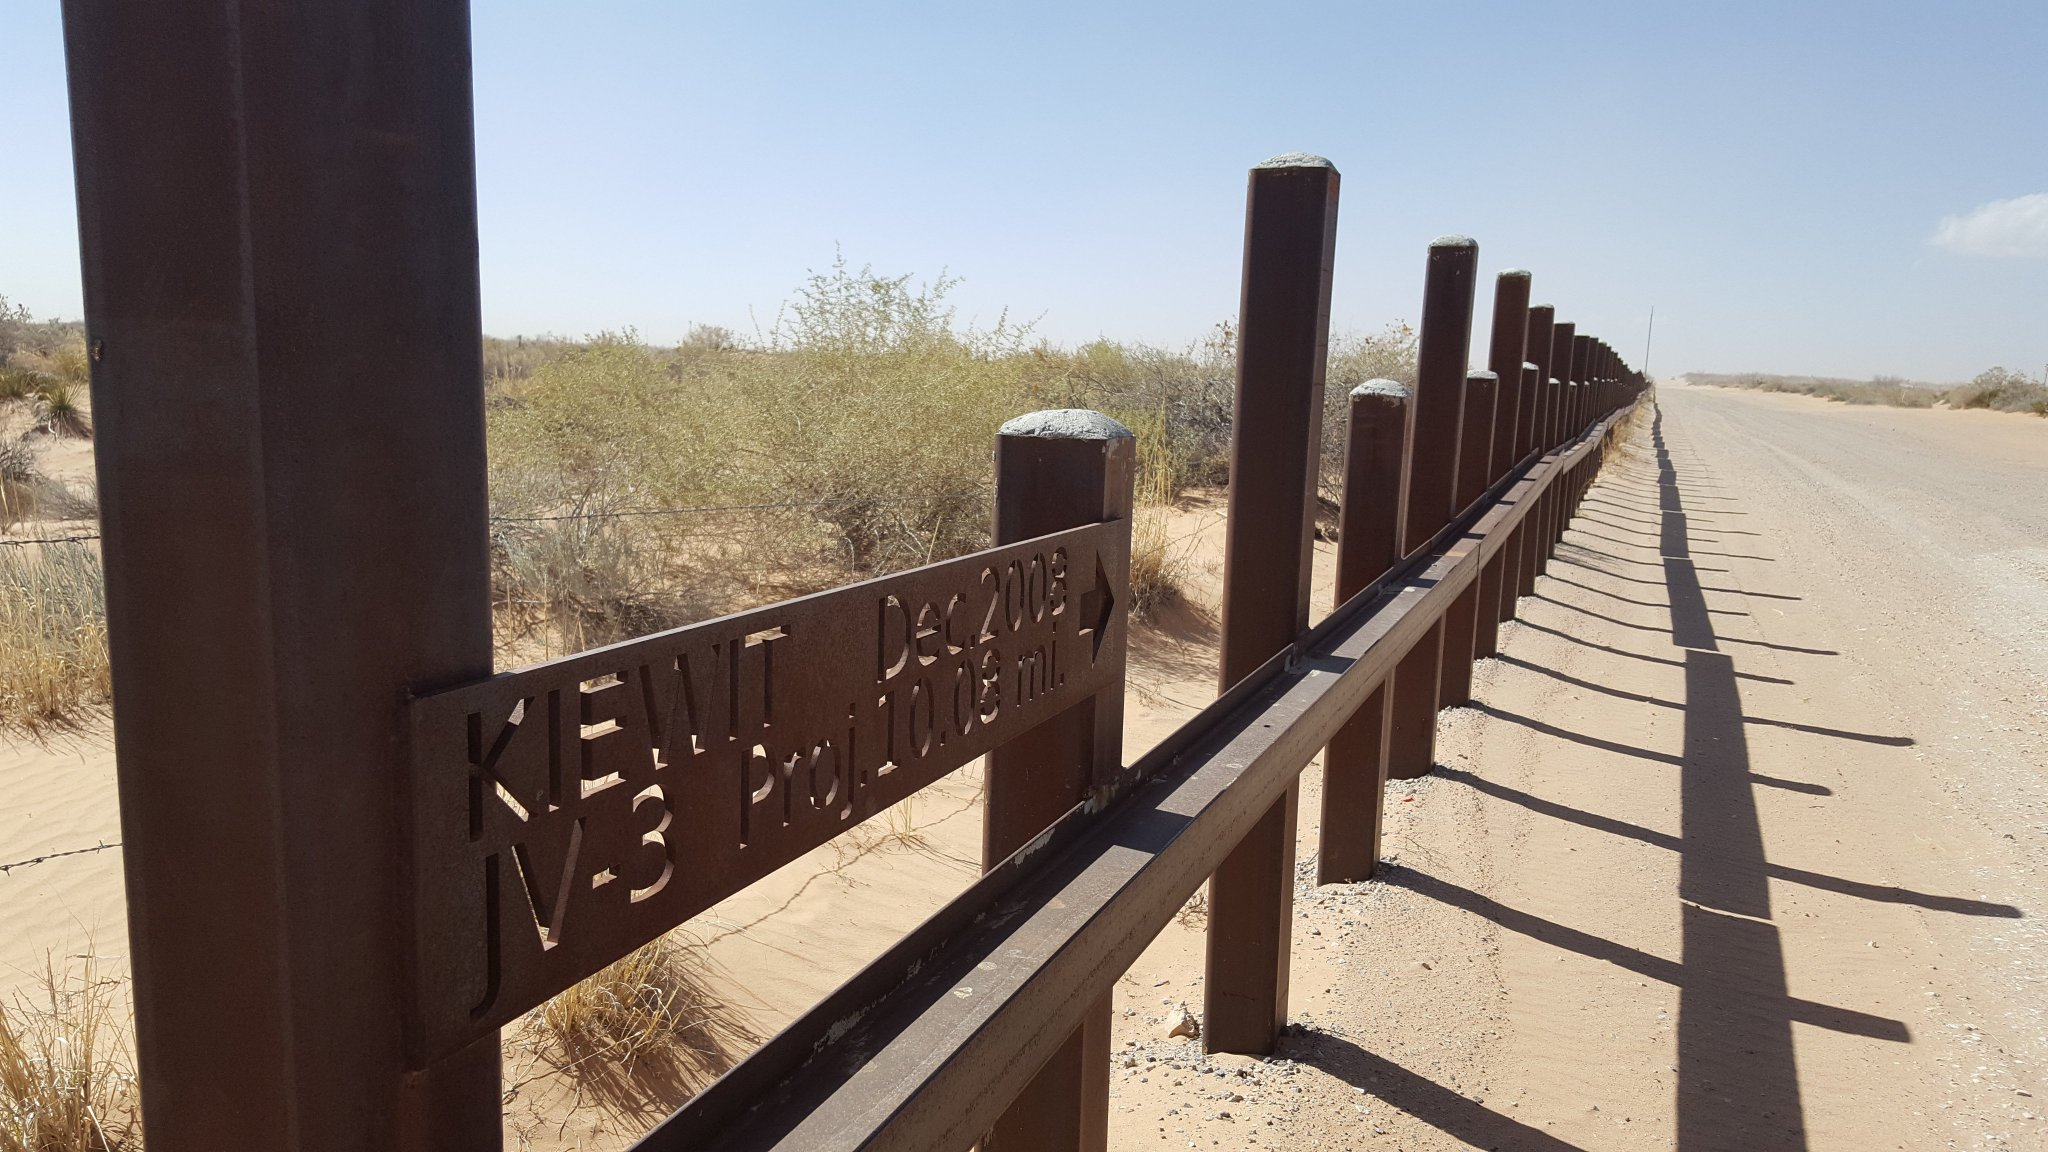 CBP to Temporarily Halt Vehicular Traffic at the Juarez